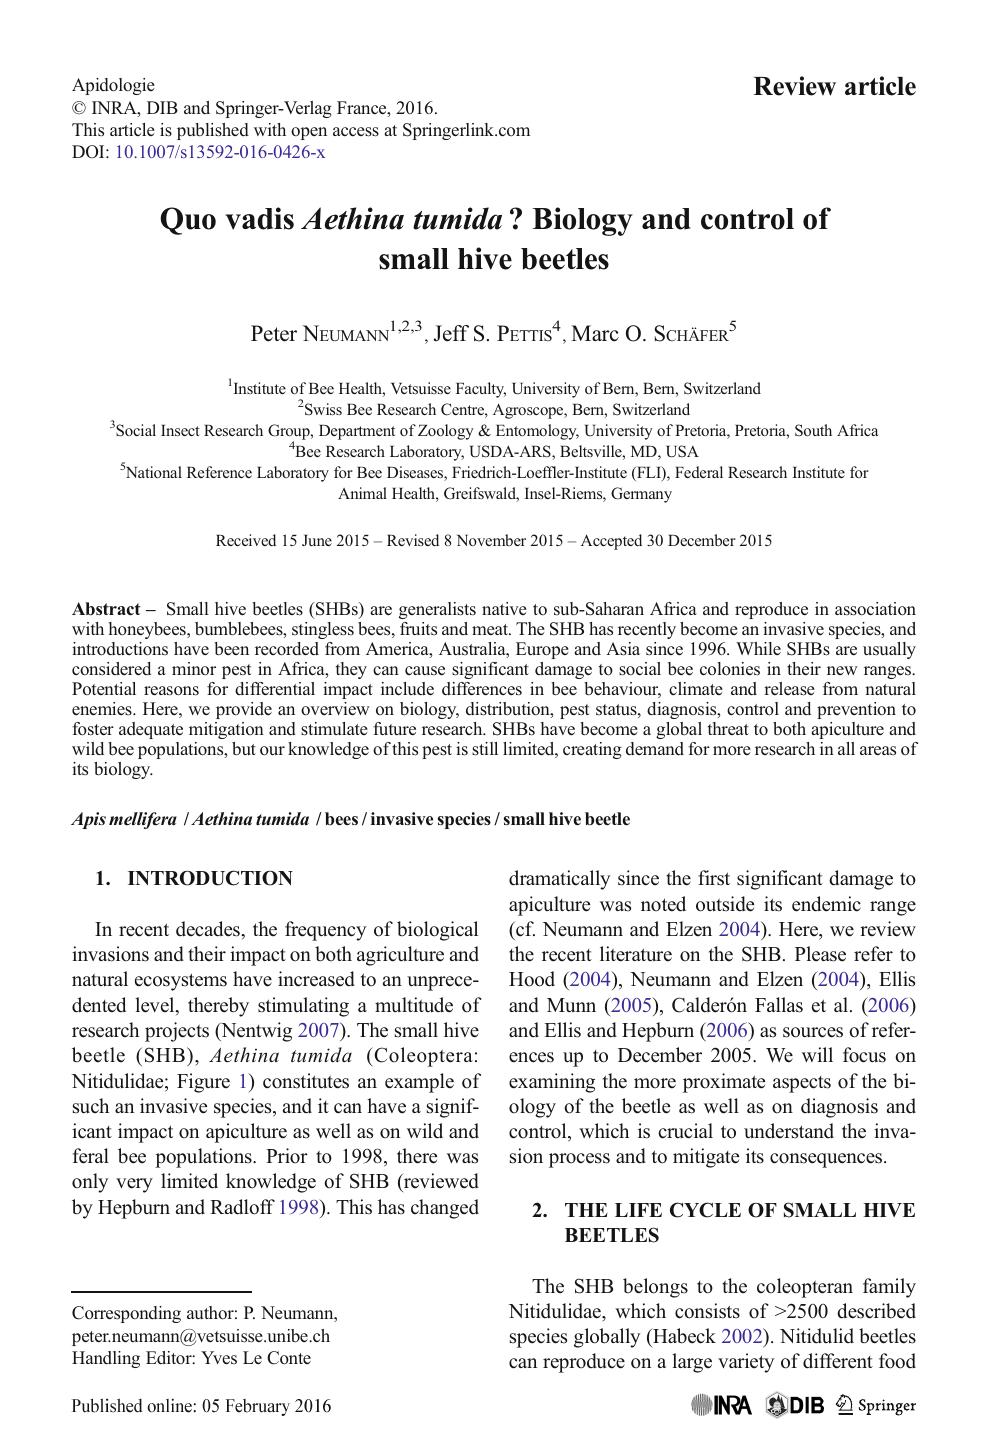 Quo vadis Aethina tumida? Biology and control of small hive